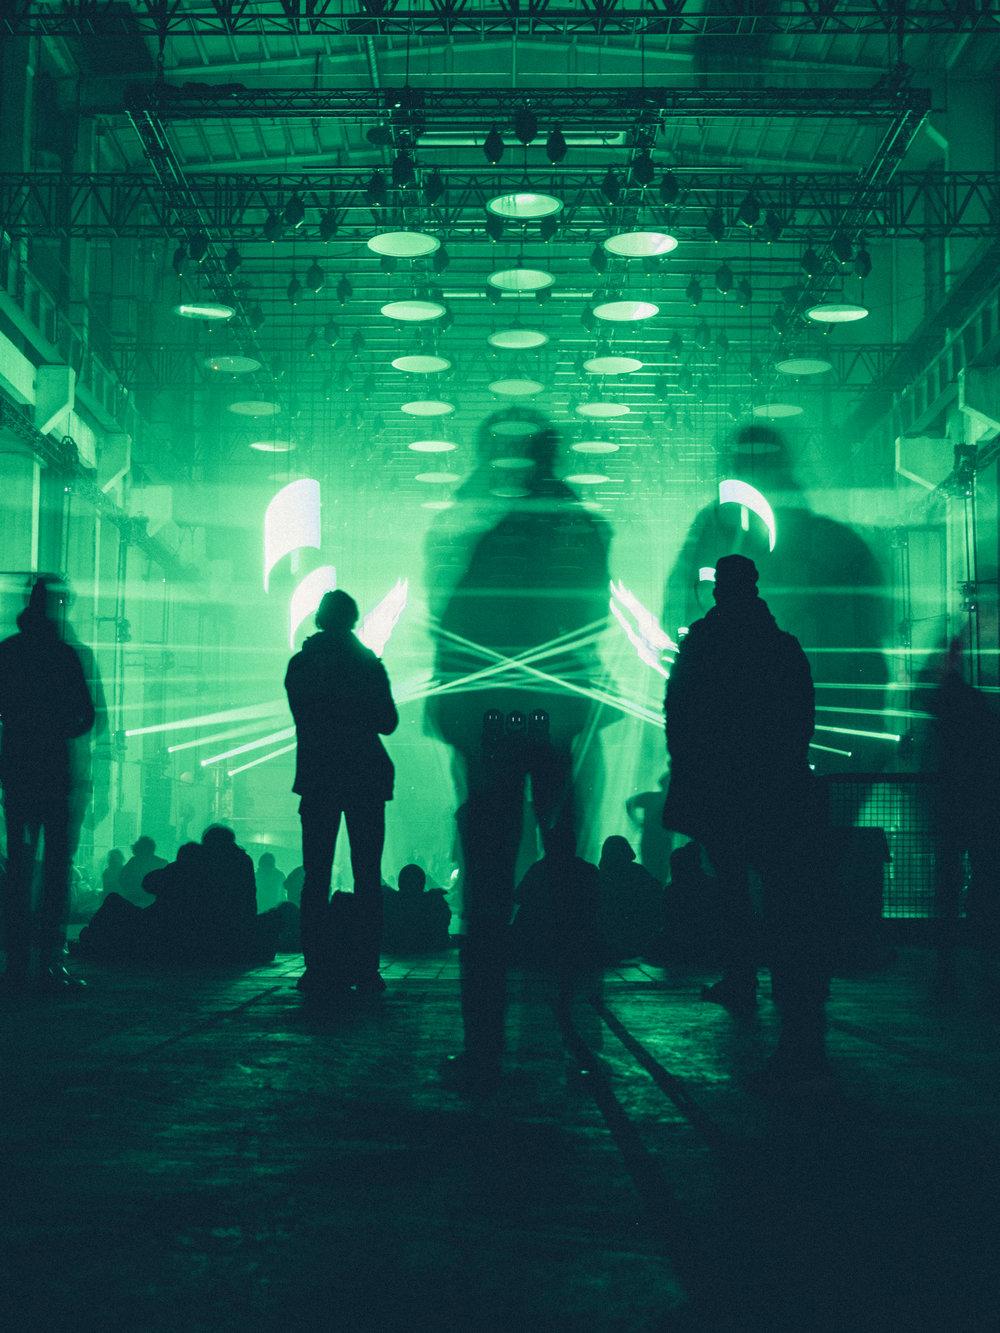 skalar-art-exhibit-berlin-kraftwerk-long-exposure